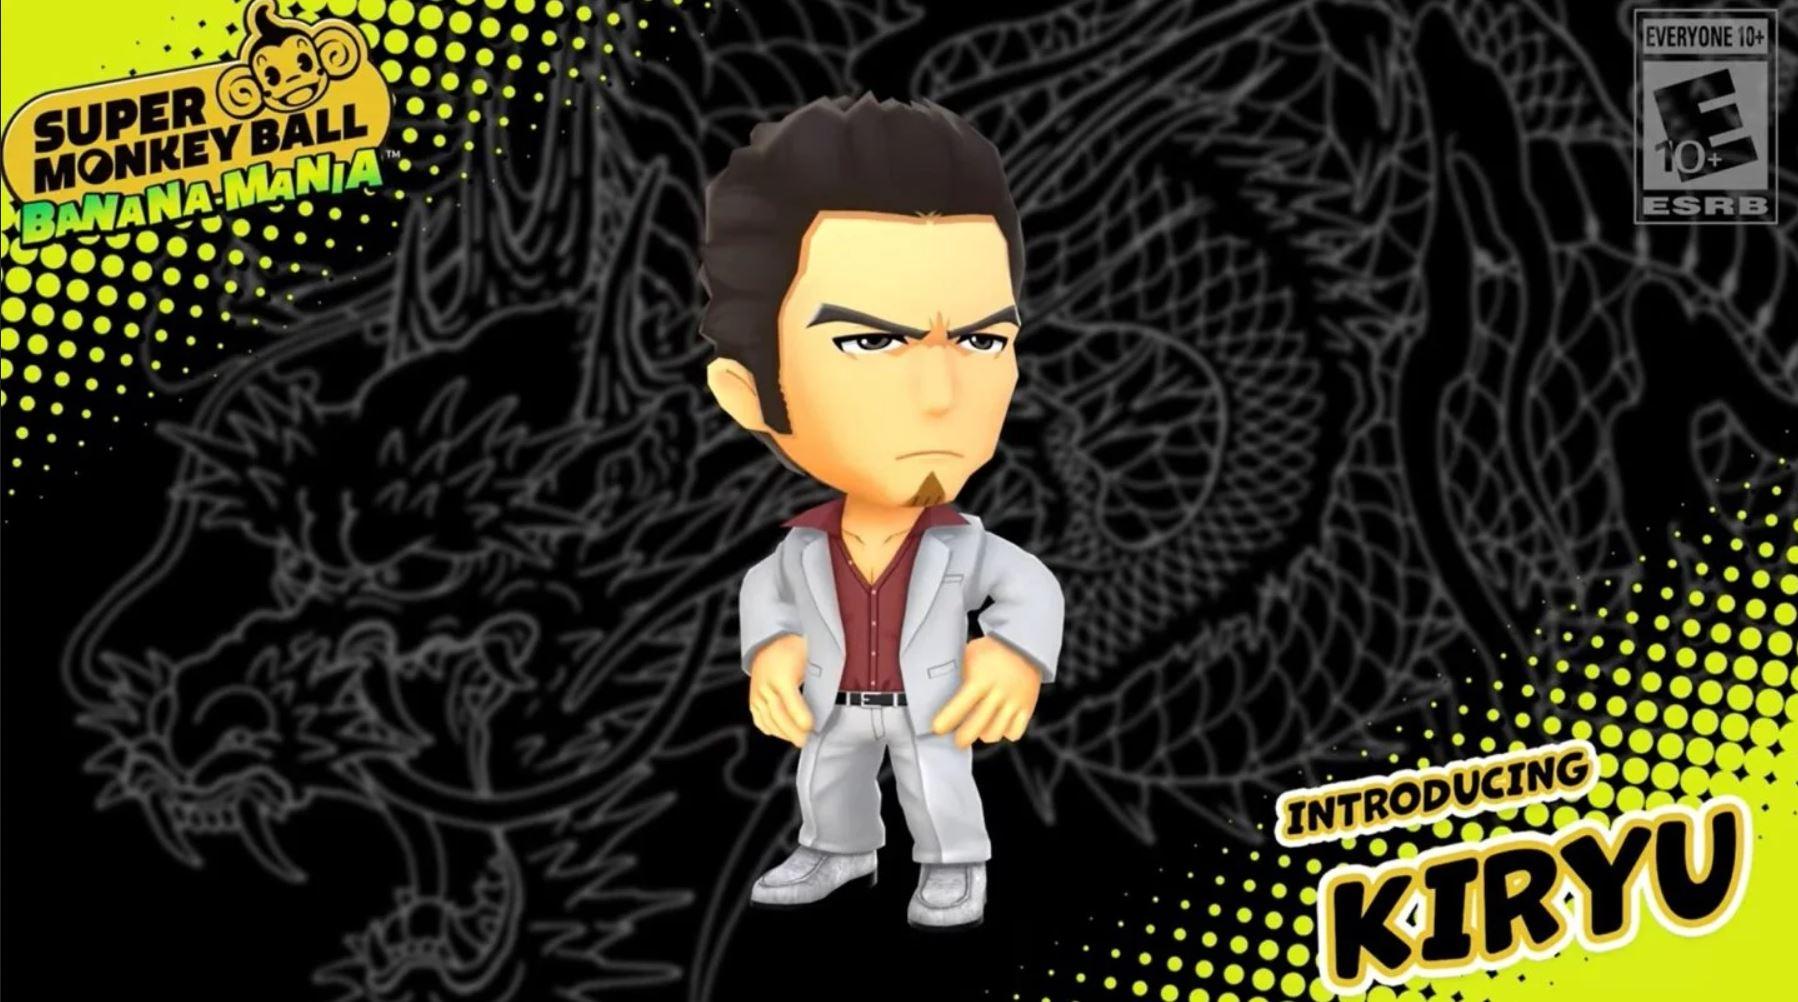 super monkey ball kiryu yakuza